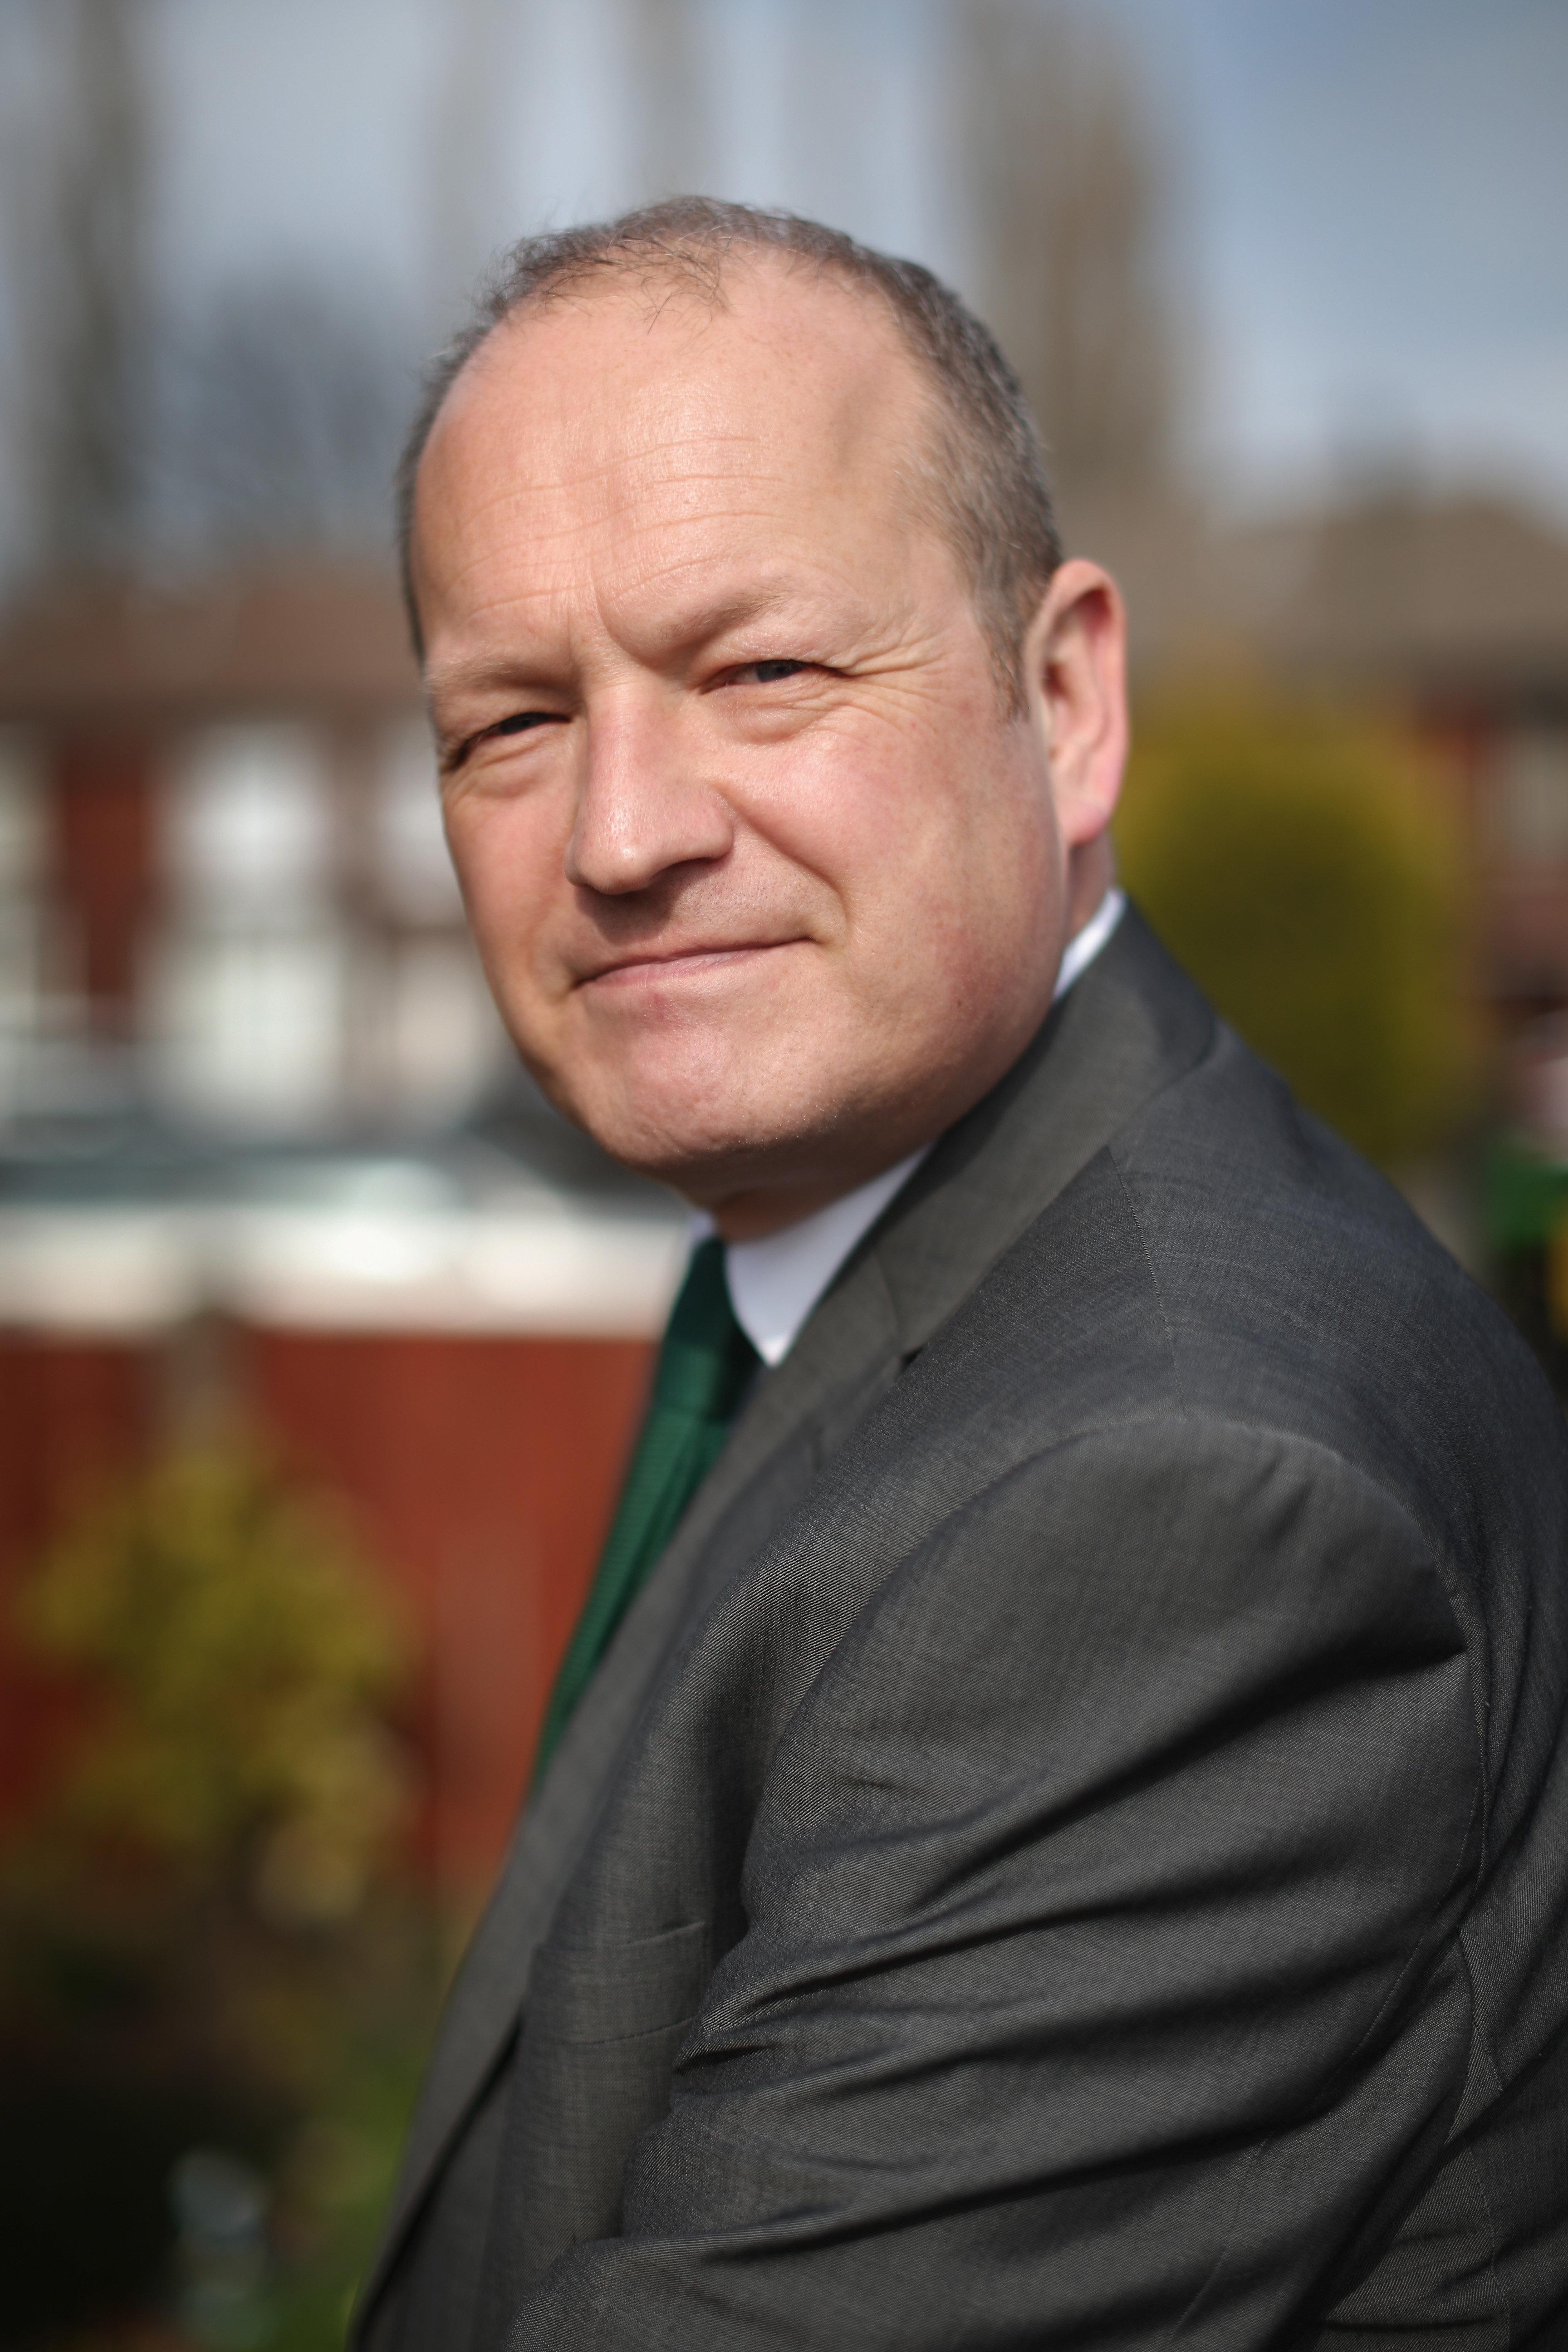 Former Labour MP Simon Danczukhas described an allegation of rape against him as 'totally